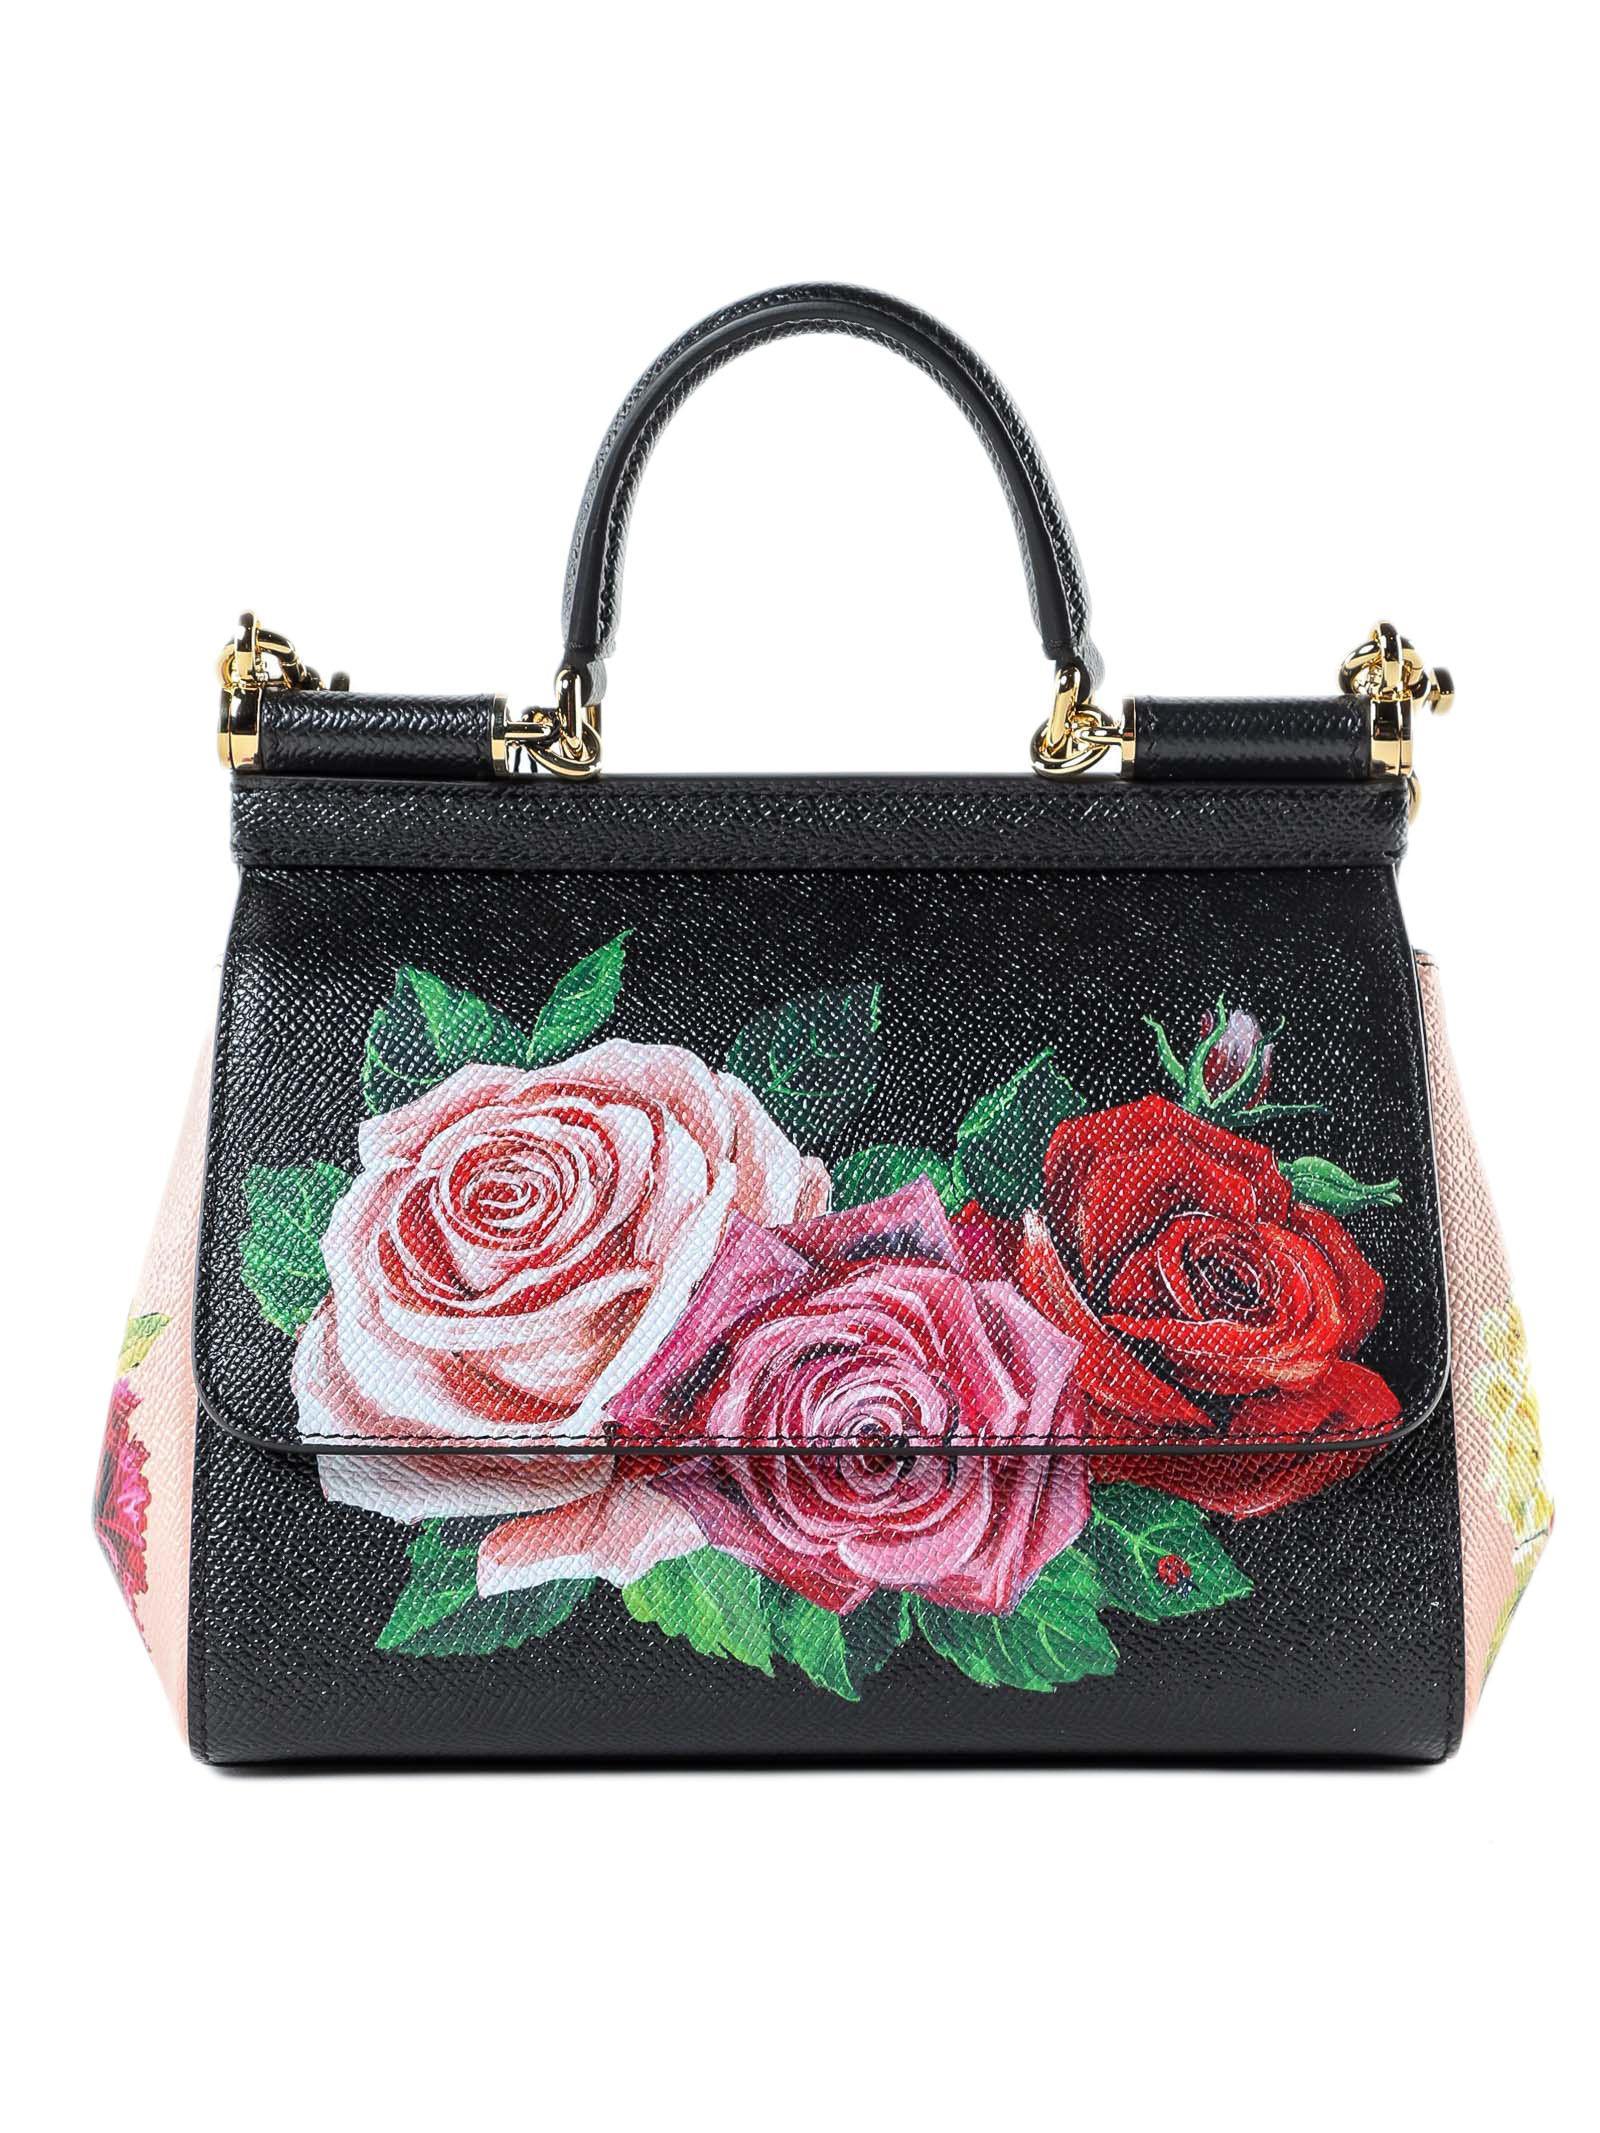 Dolce   Gabbana. Women s St.dauphine Handbag 865e0e8e4b1ff